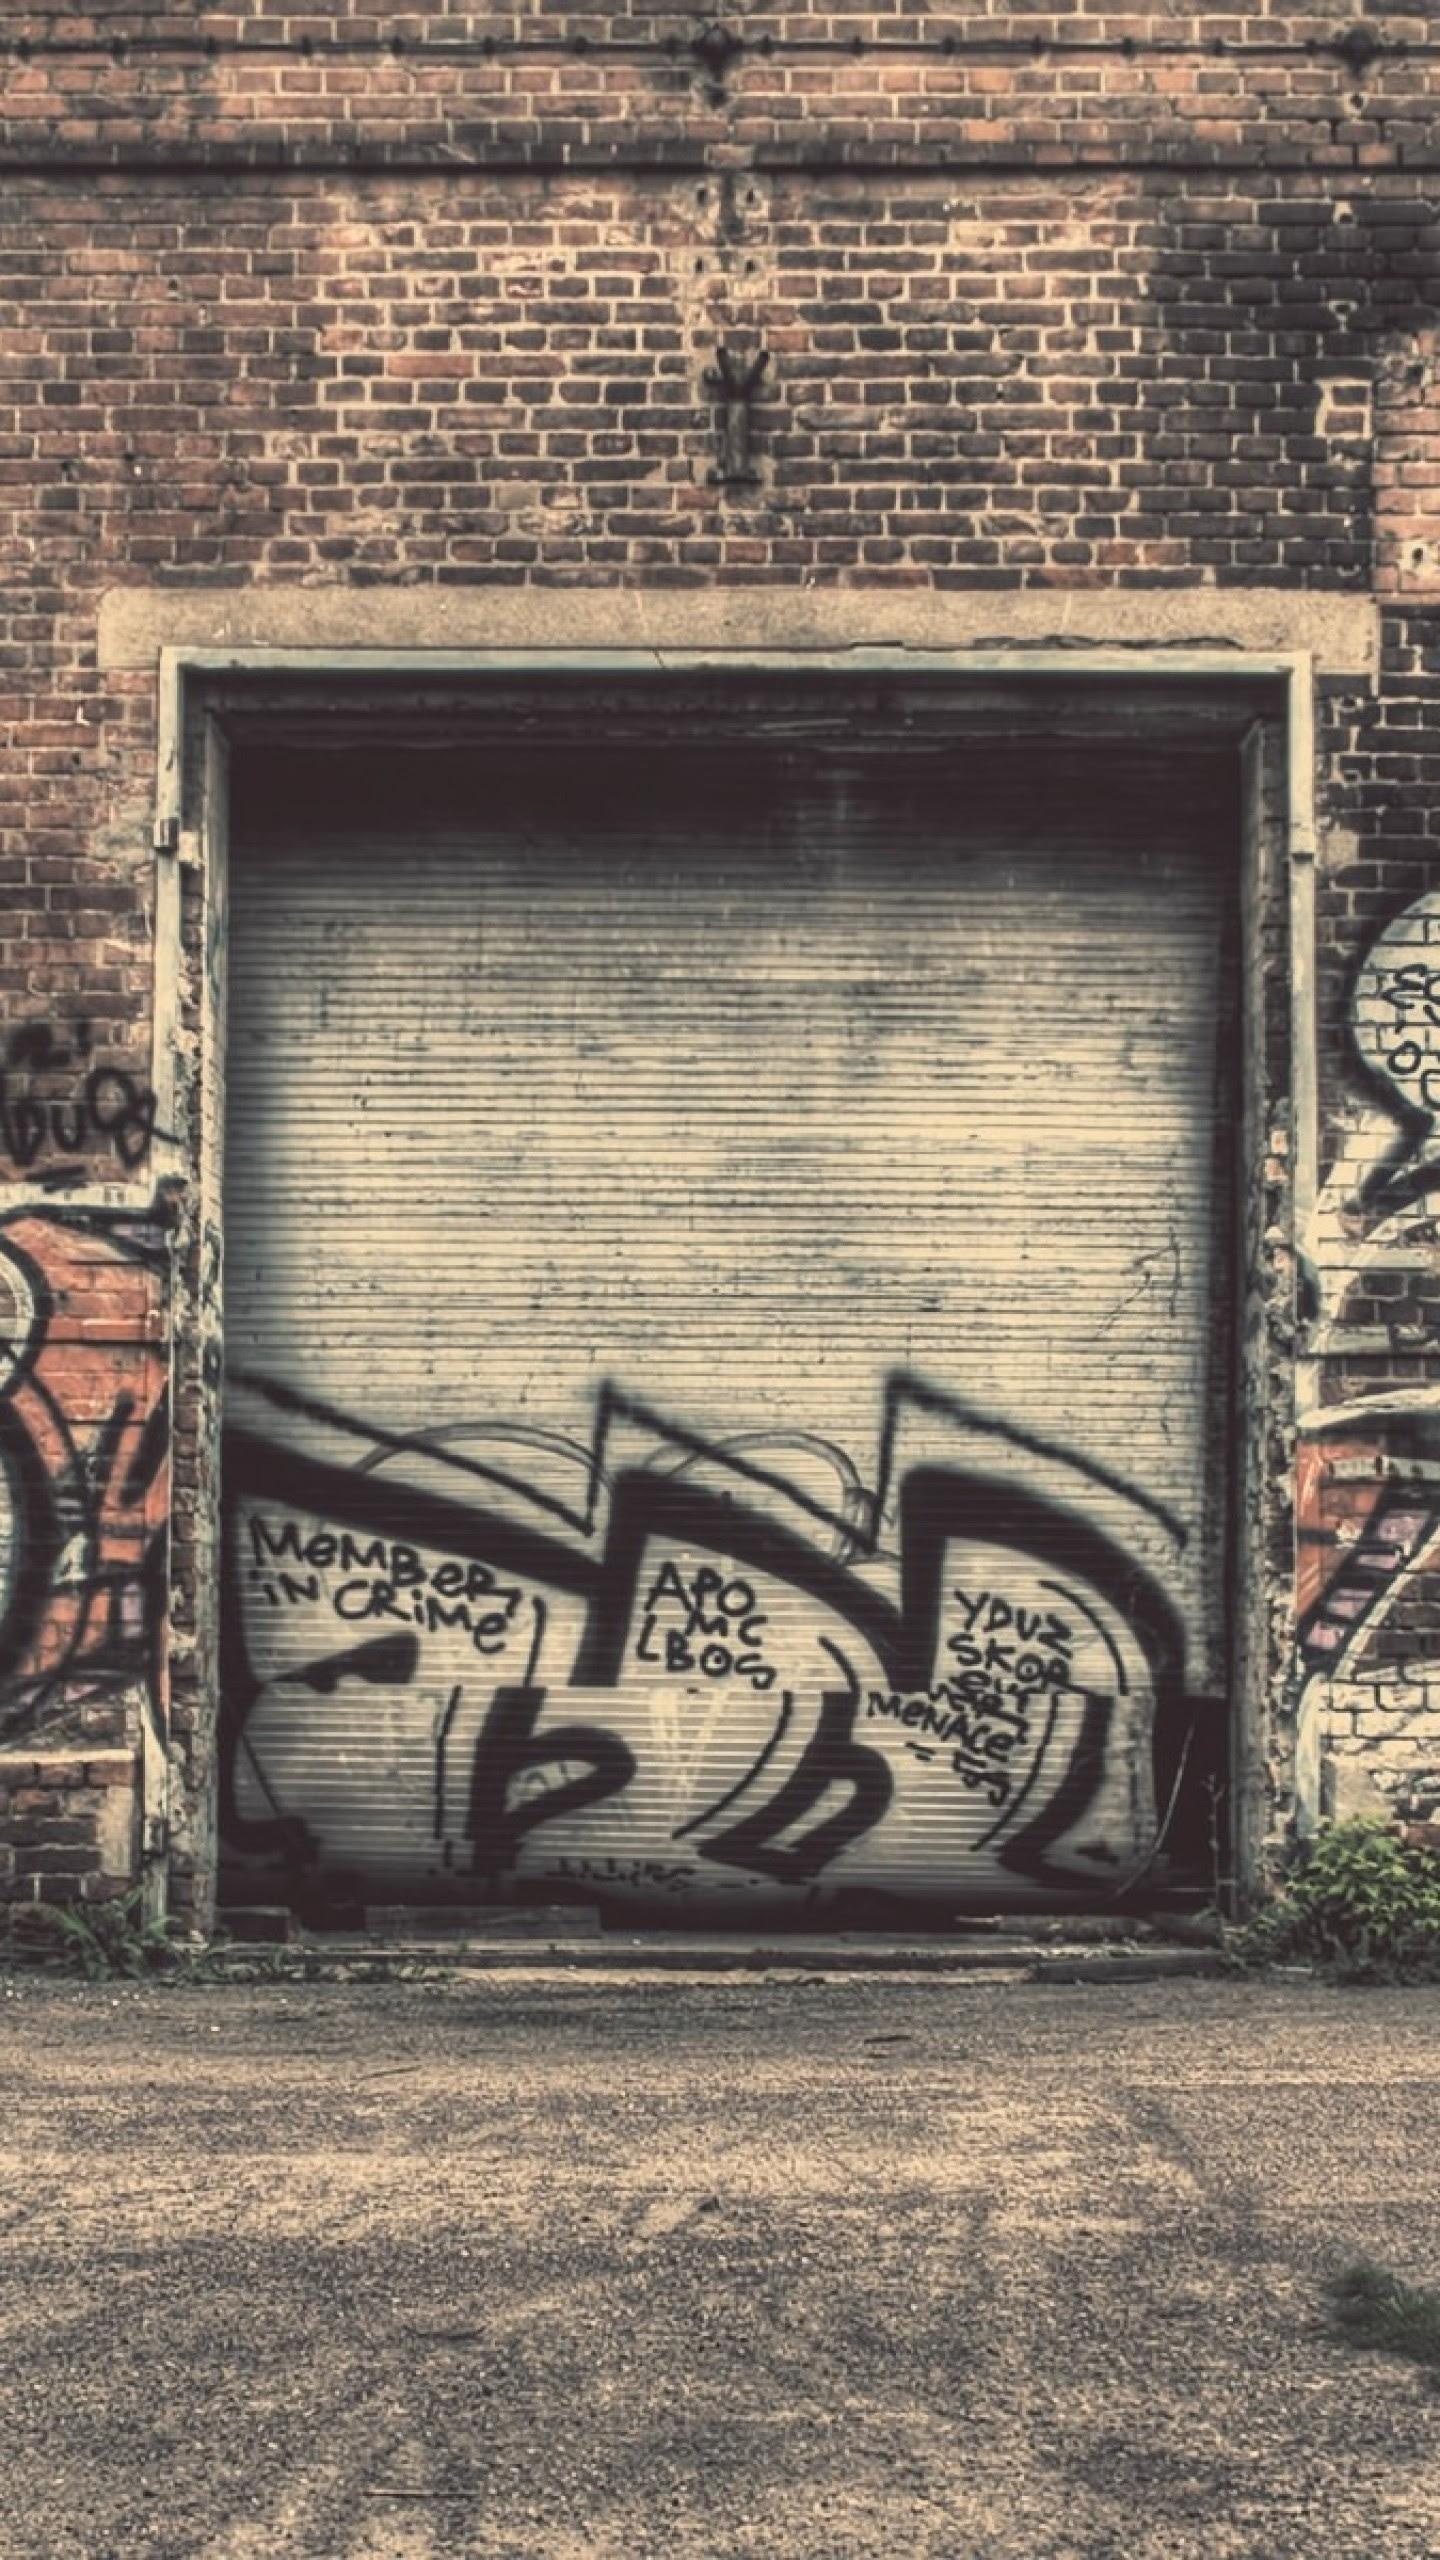 Download 5300 Wallpaper Iphone Old School Gambar Gratis